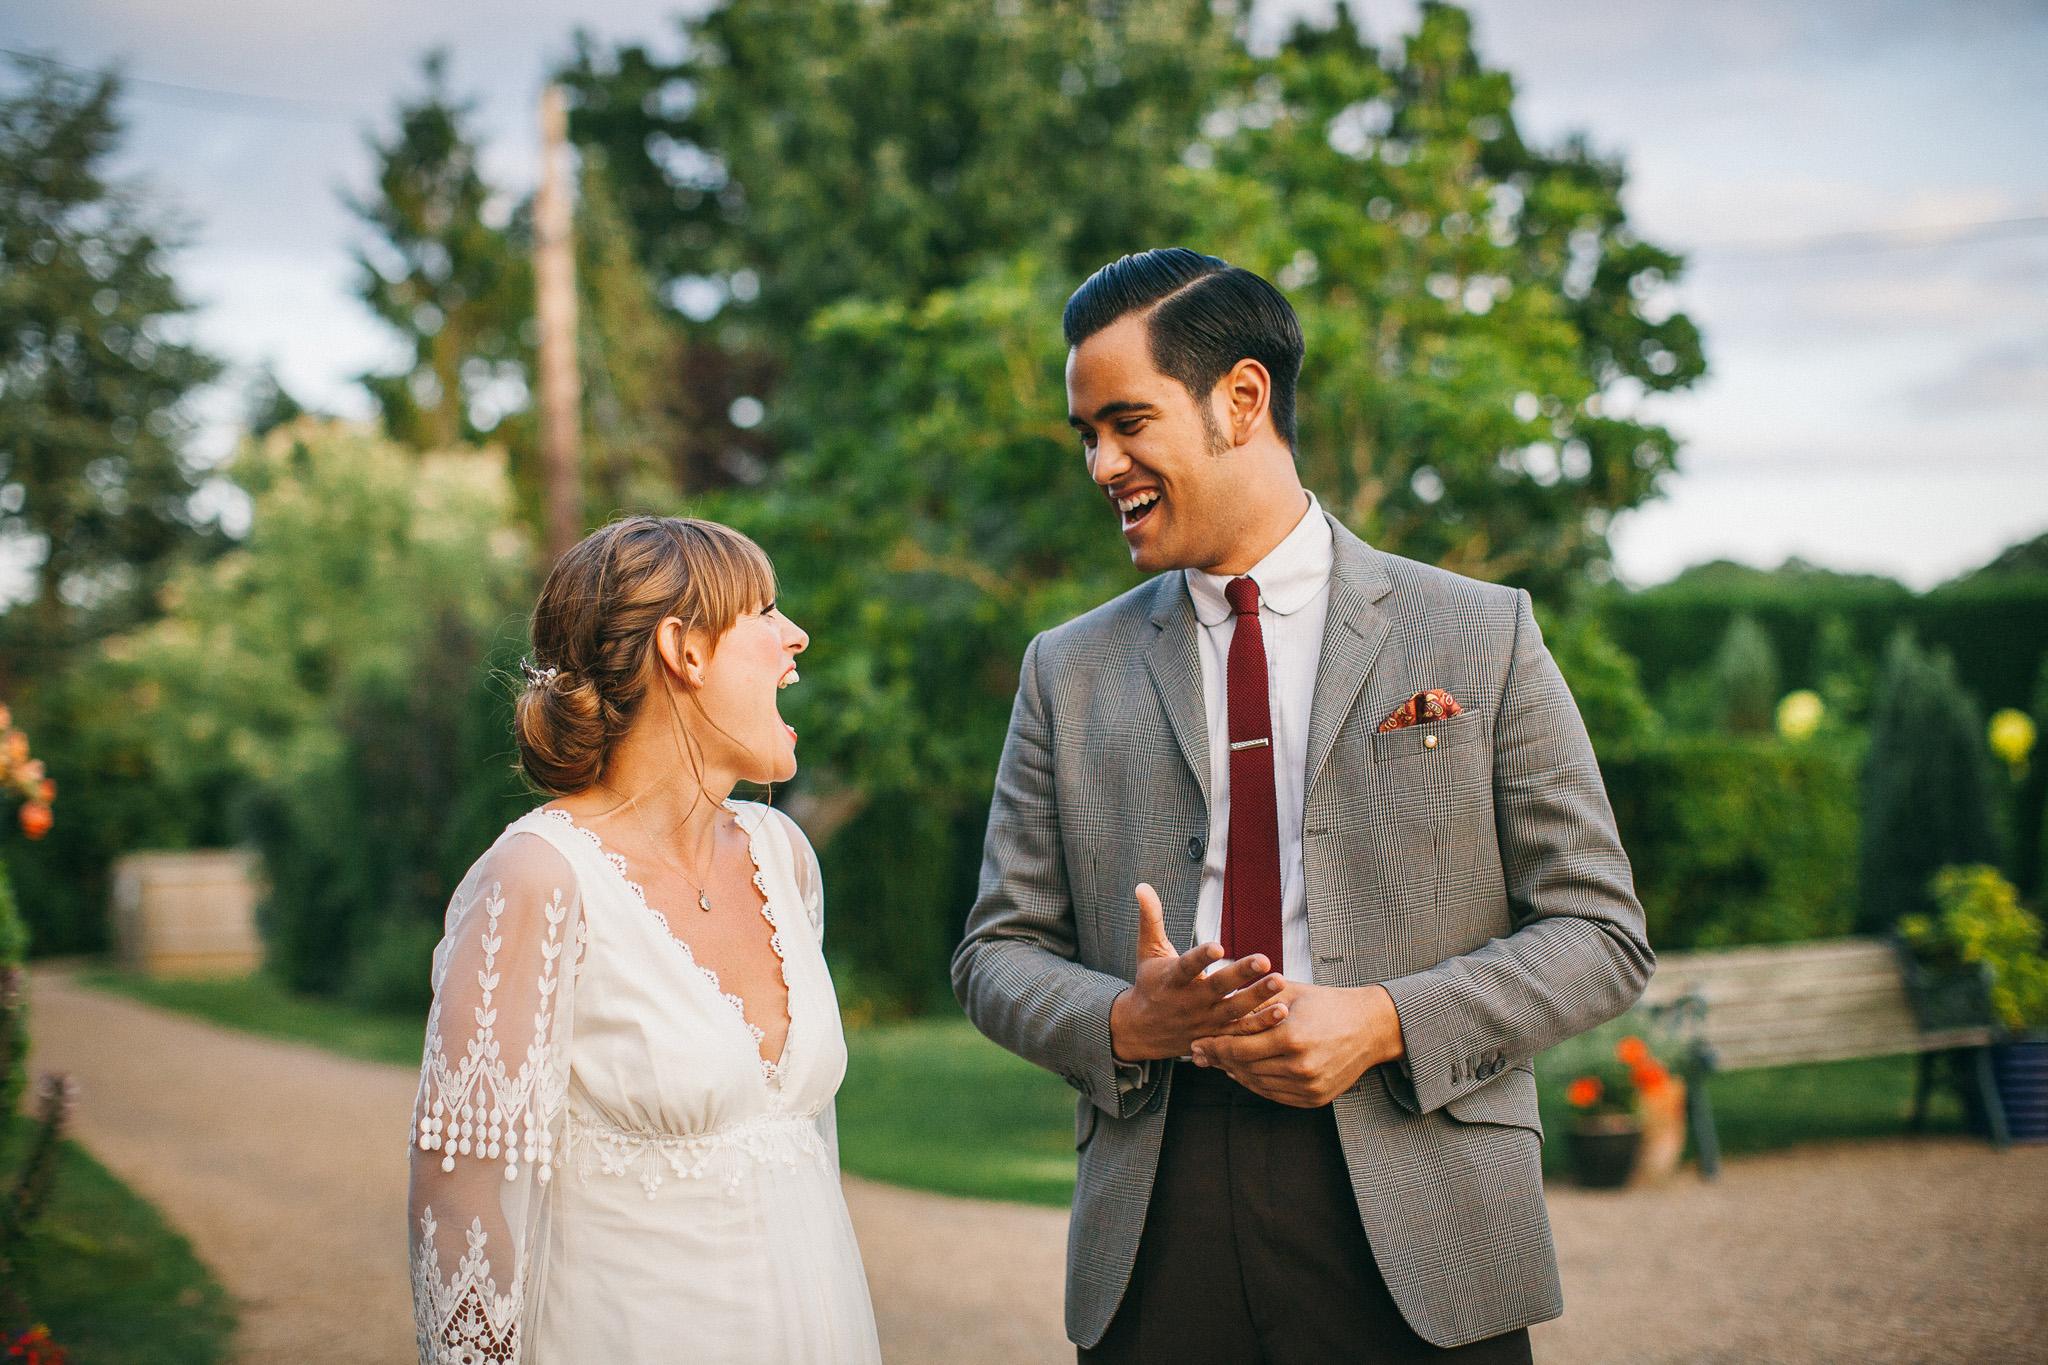 chantry_sussex_barn_wedding_353.jpg